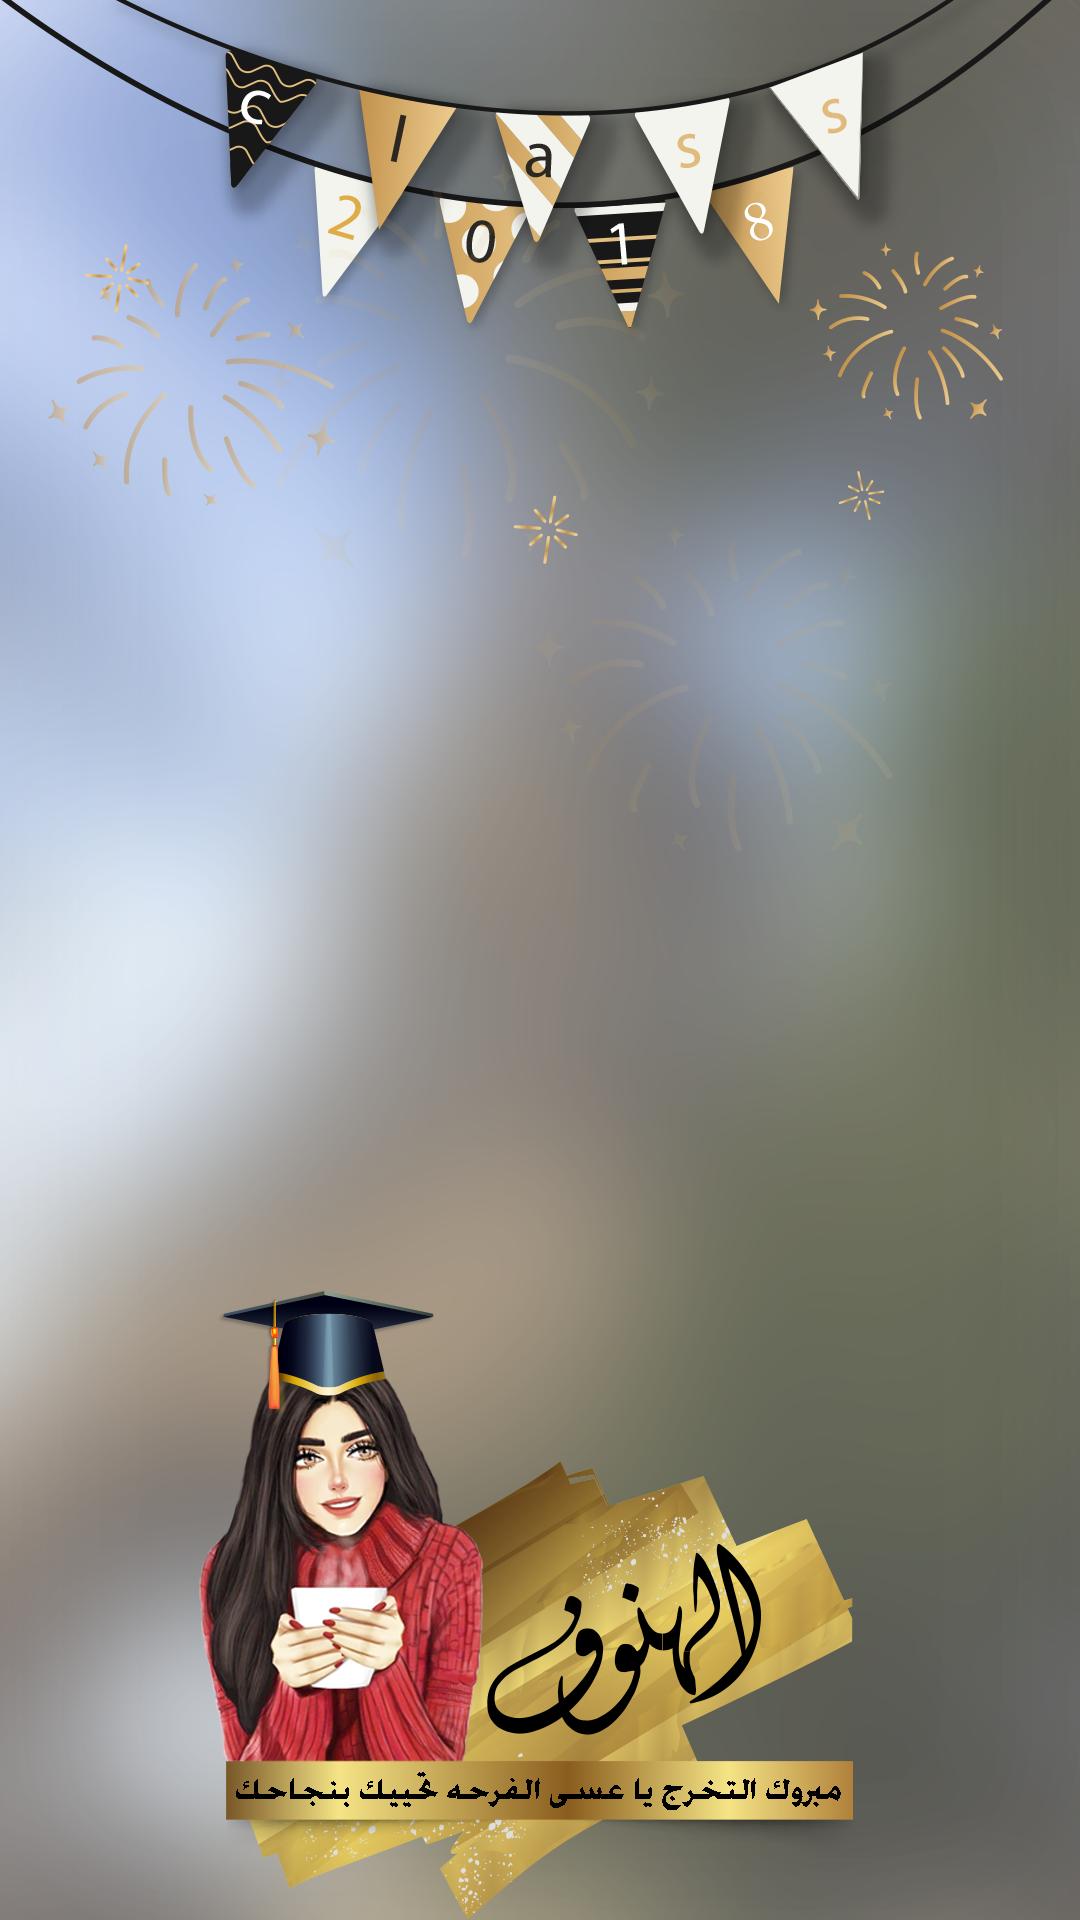 فلتر تخرج احترافي لعام 2018 لتصميم فلاتر سناب شات فلتر تخرج فلاتر فلتر خاص فلتر زواج فلتر مواليد فلاتر سناب شات Graduation Gift Box Cute Art Diy Crafts